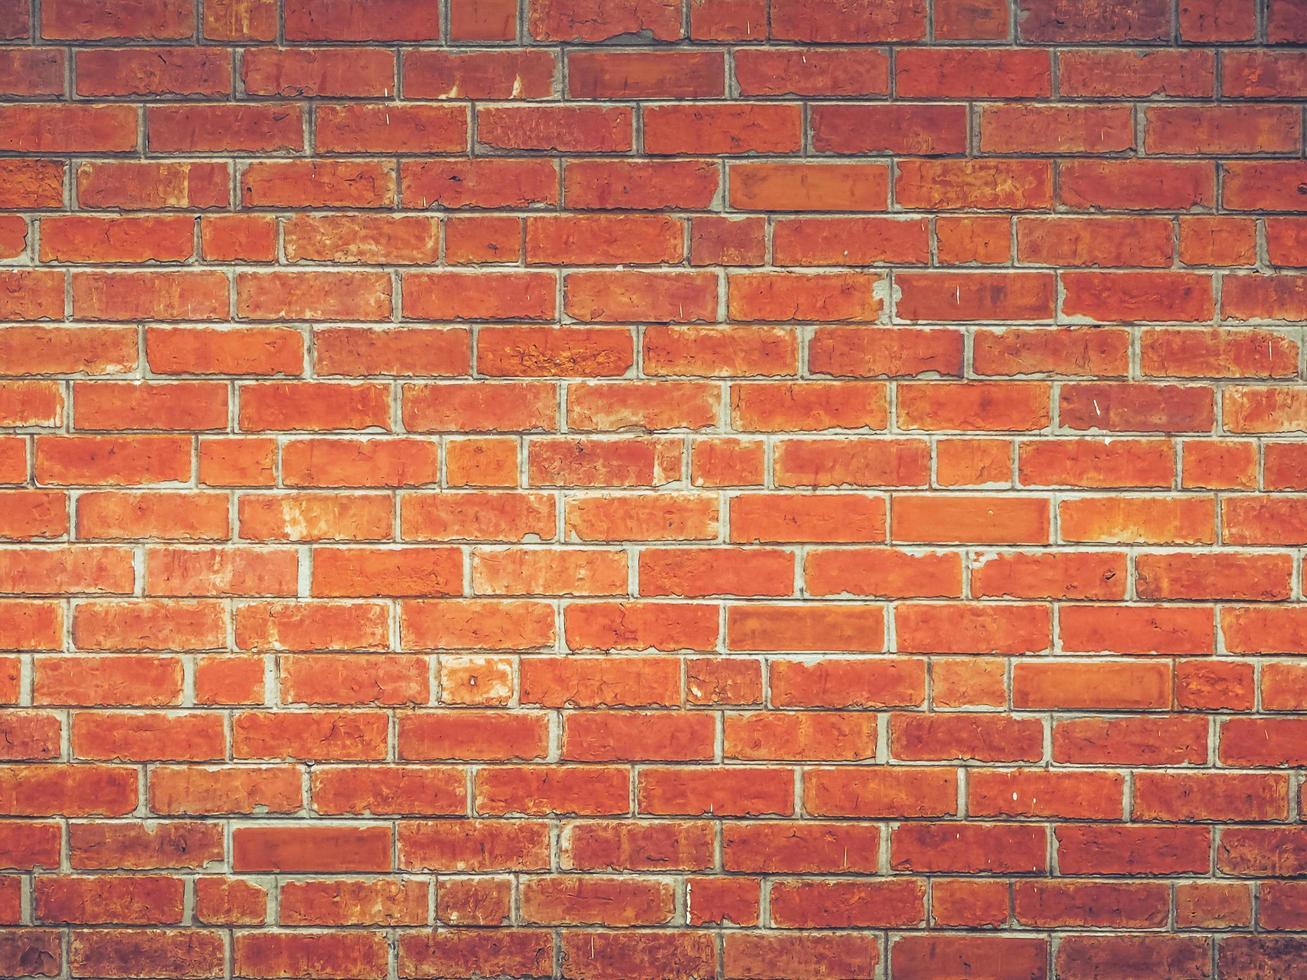 rode bakstenen muur met licht foto